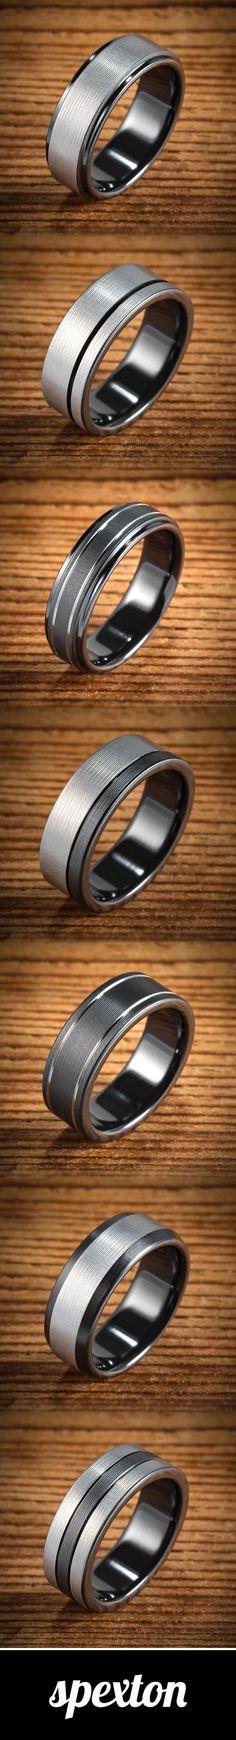 Black & Silver Bi-Color Black Zirconium Men's rings custom made by Spexton